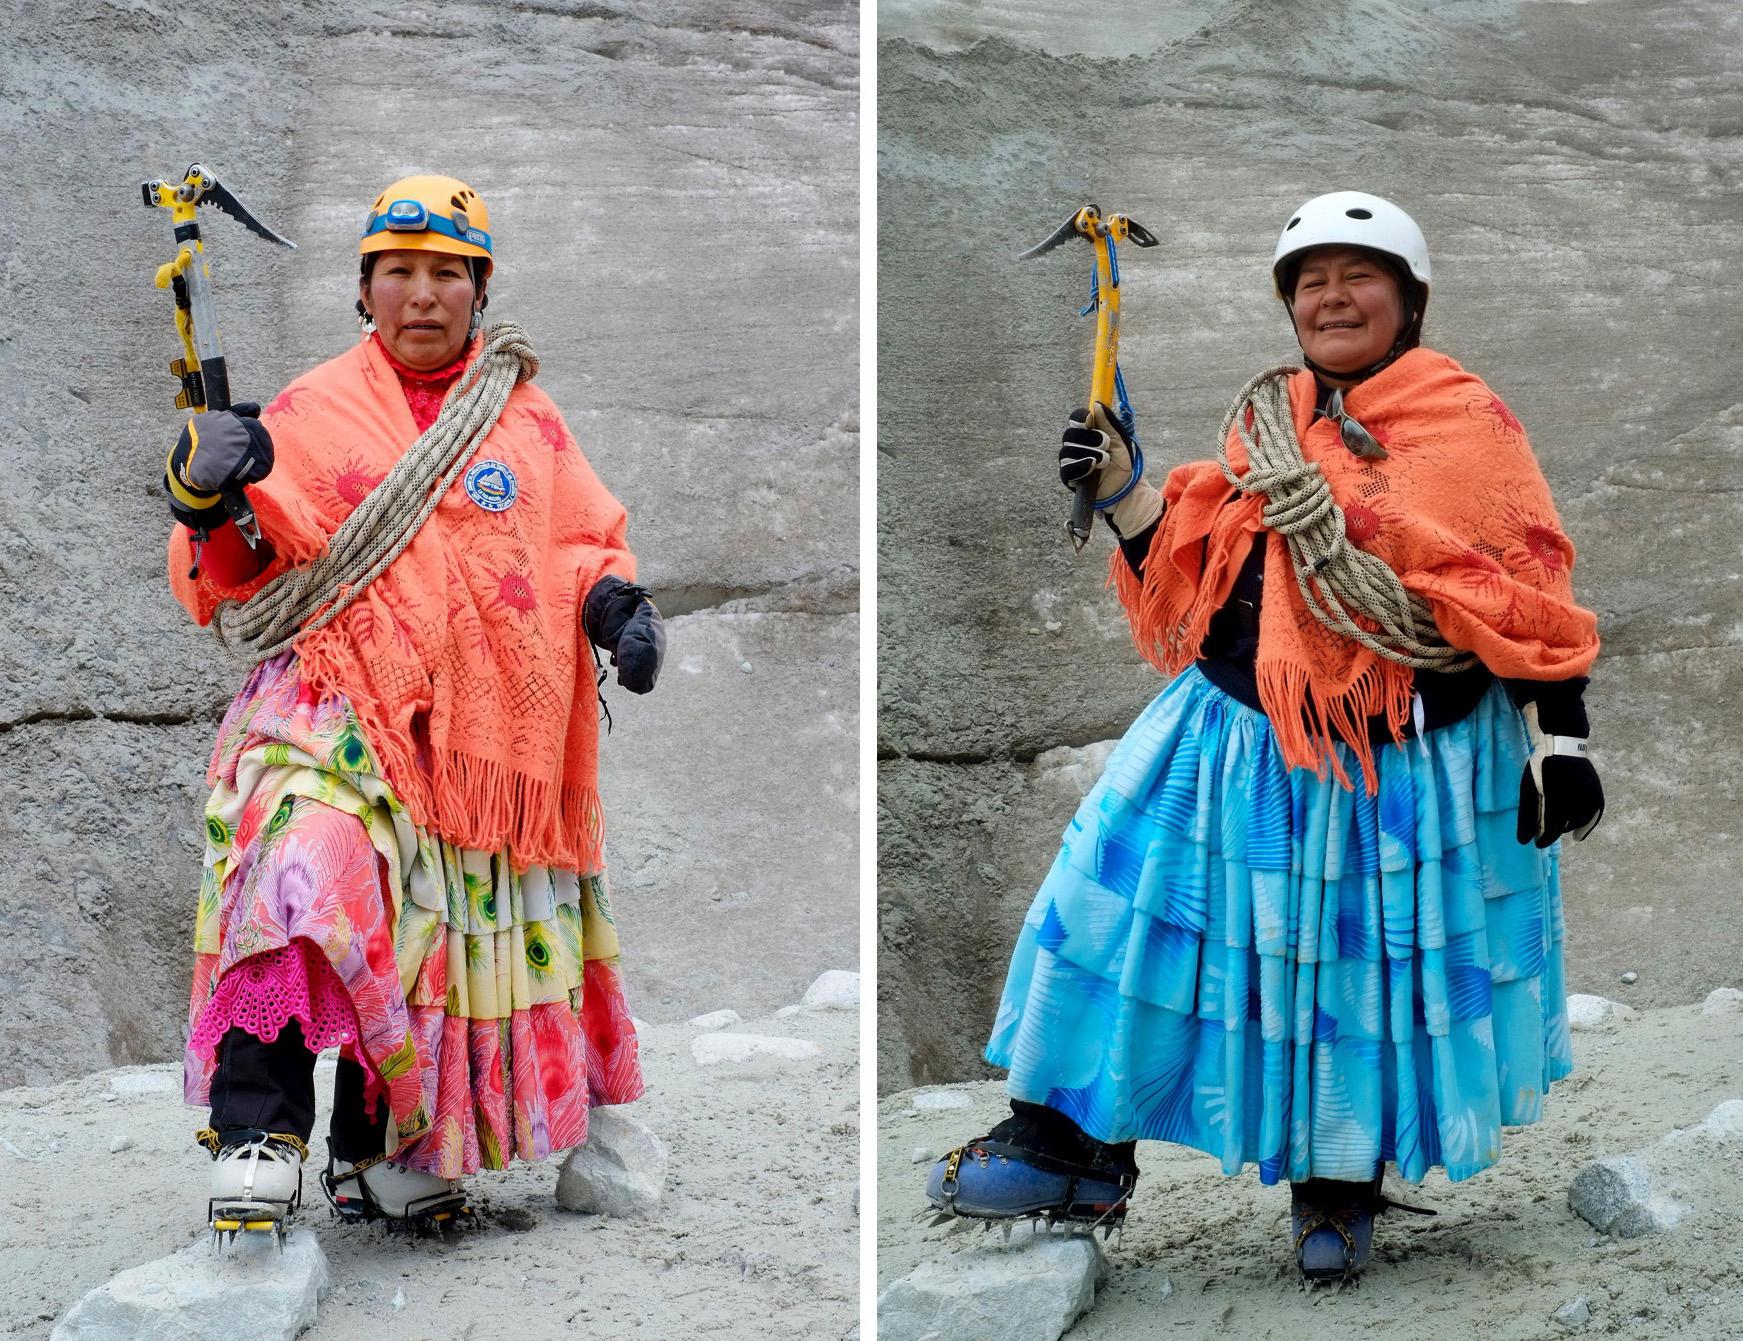 cholita mountain climbers cholita mountain climbers